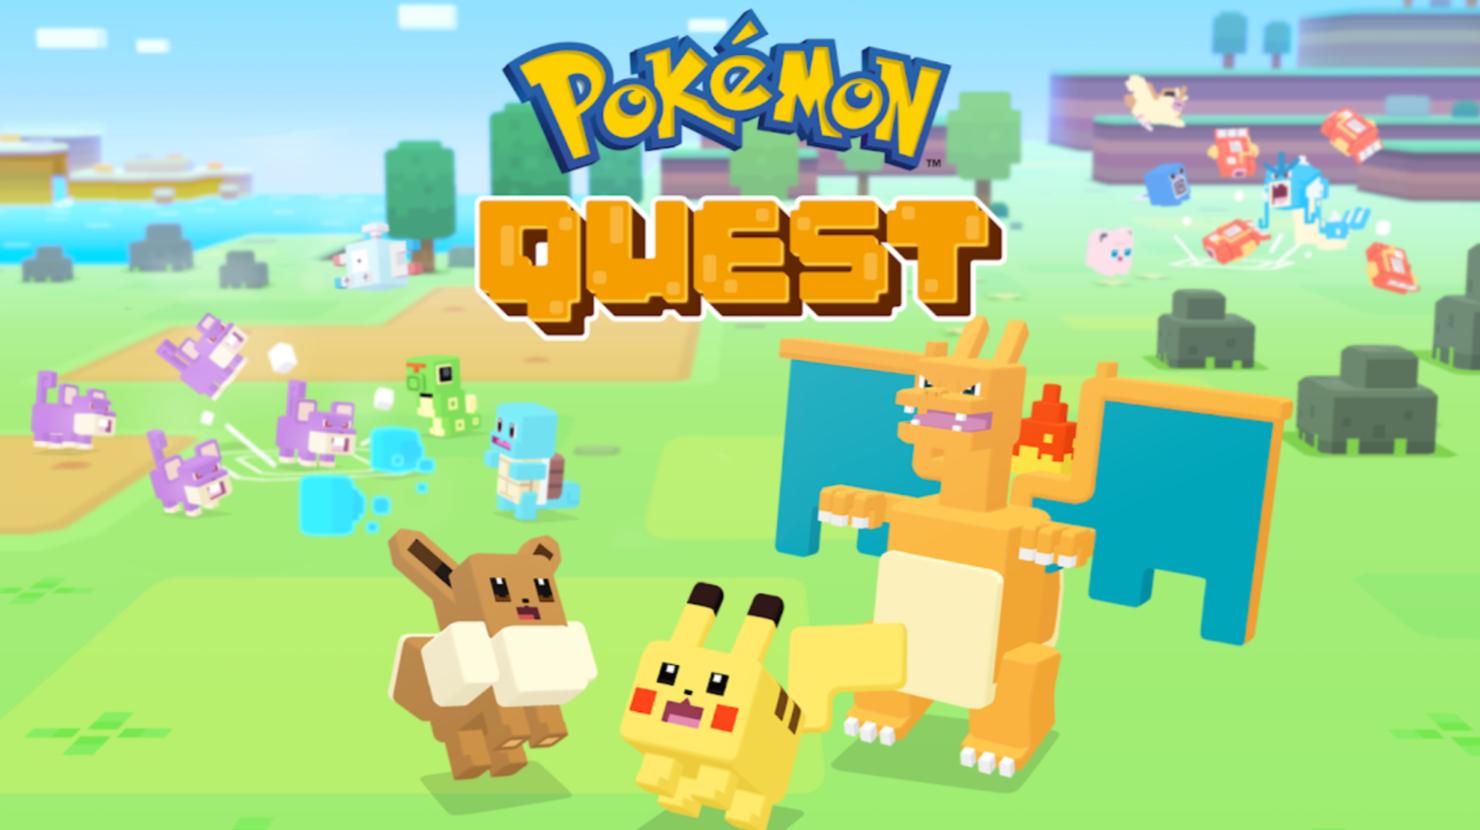 Pokemon Quest darmowa gra do pobrania na Android i iOS